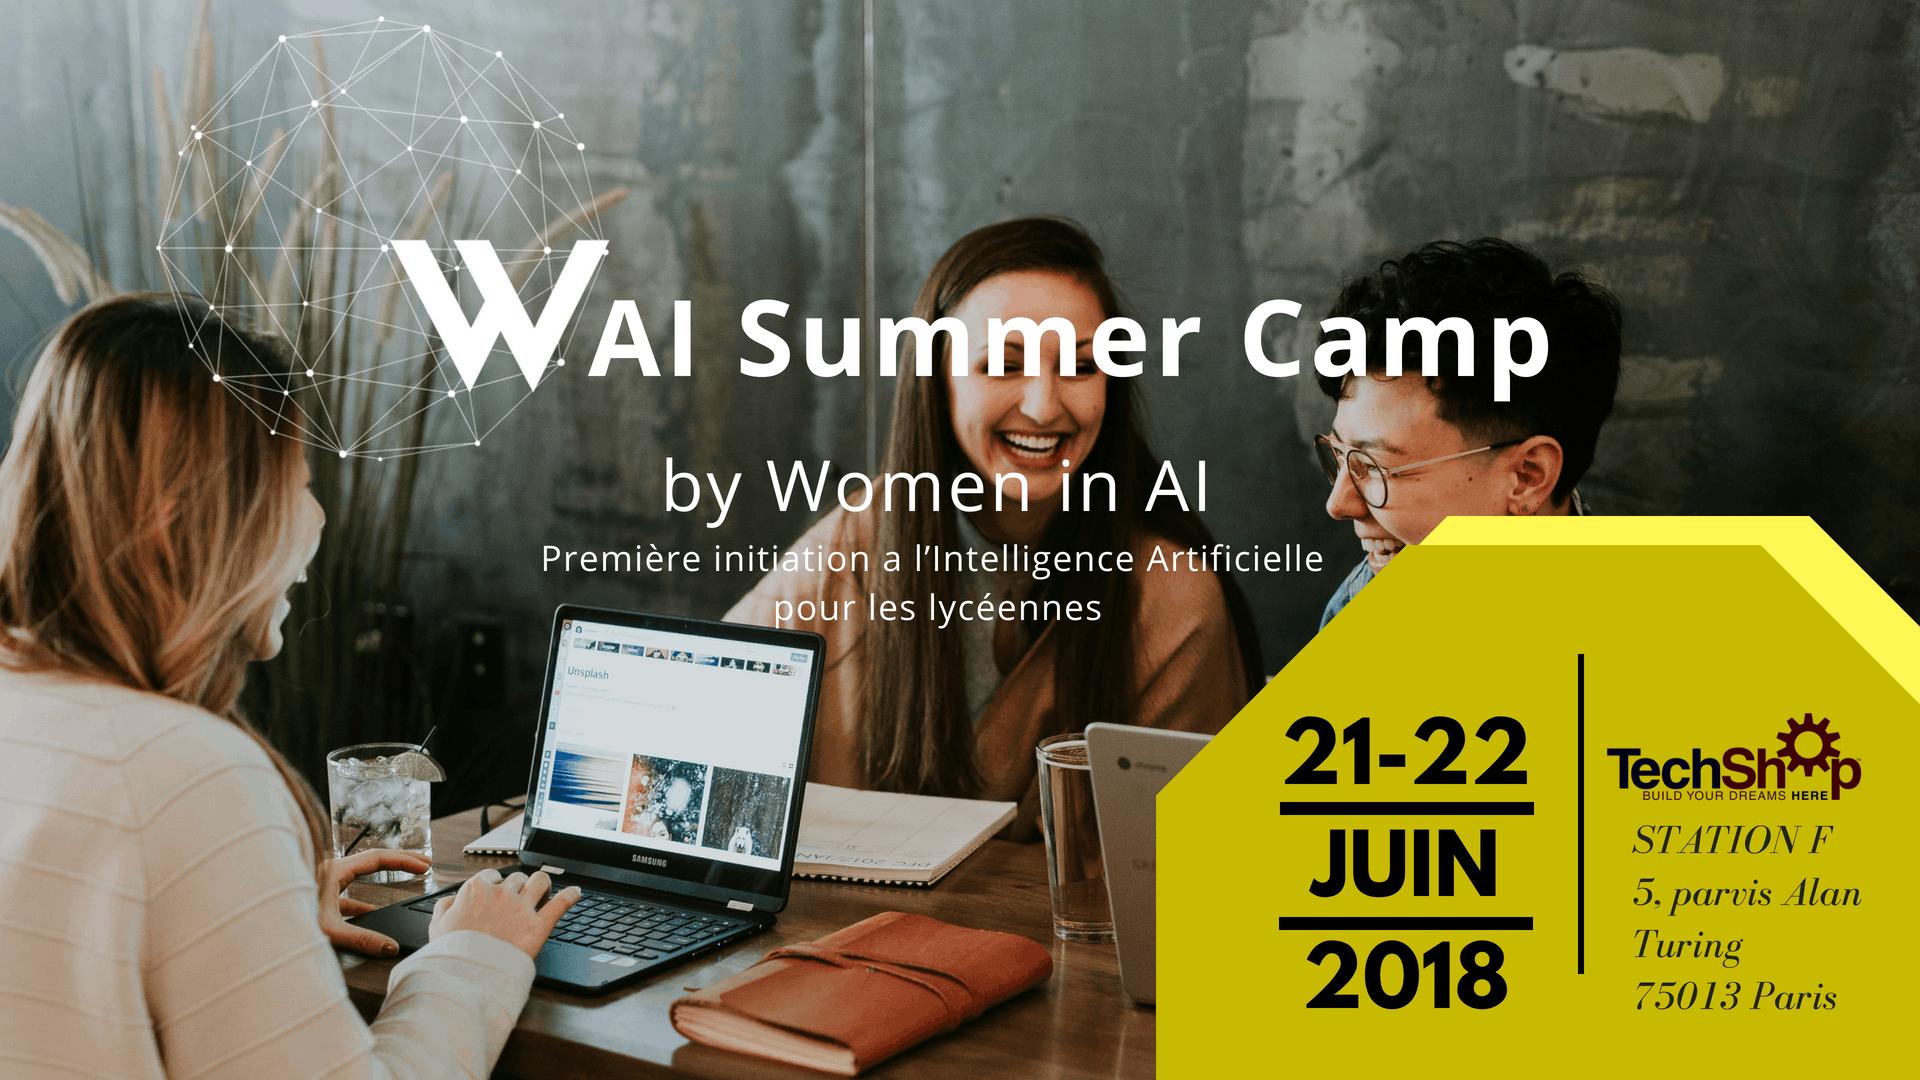 WAI Summer Camp Paris 2018 - Women in AI